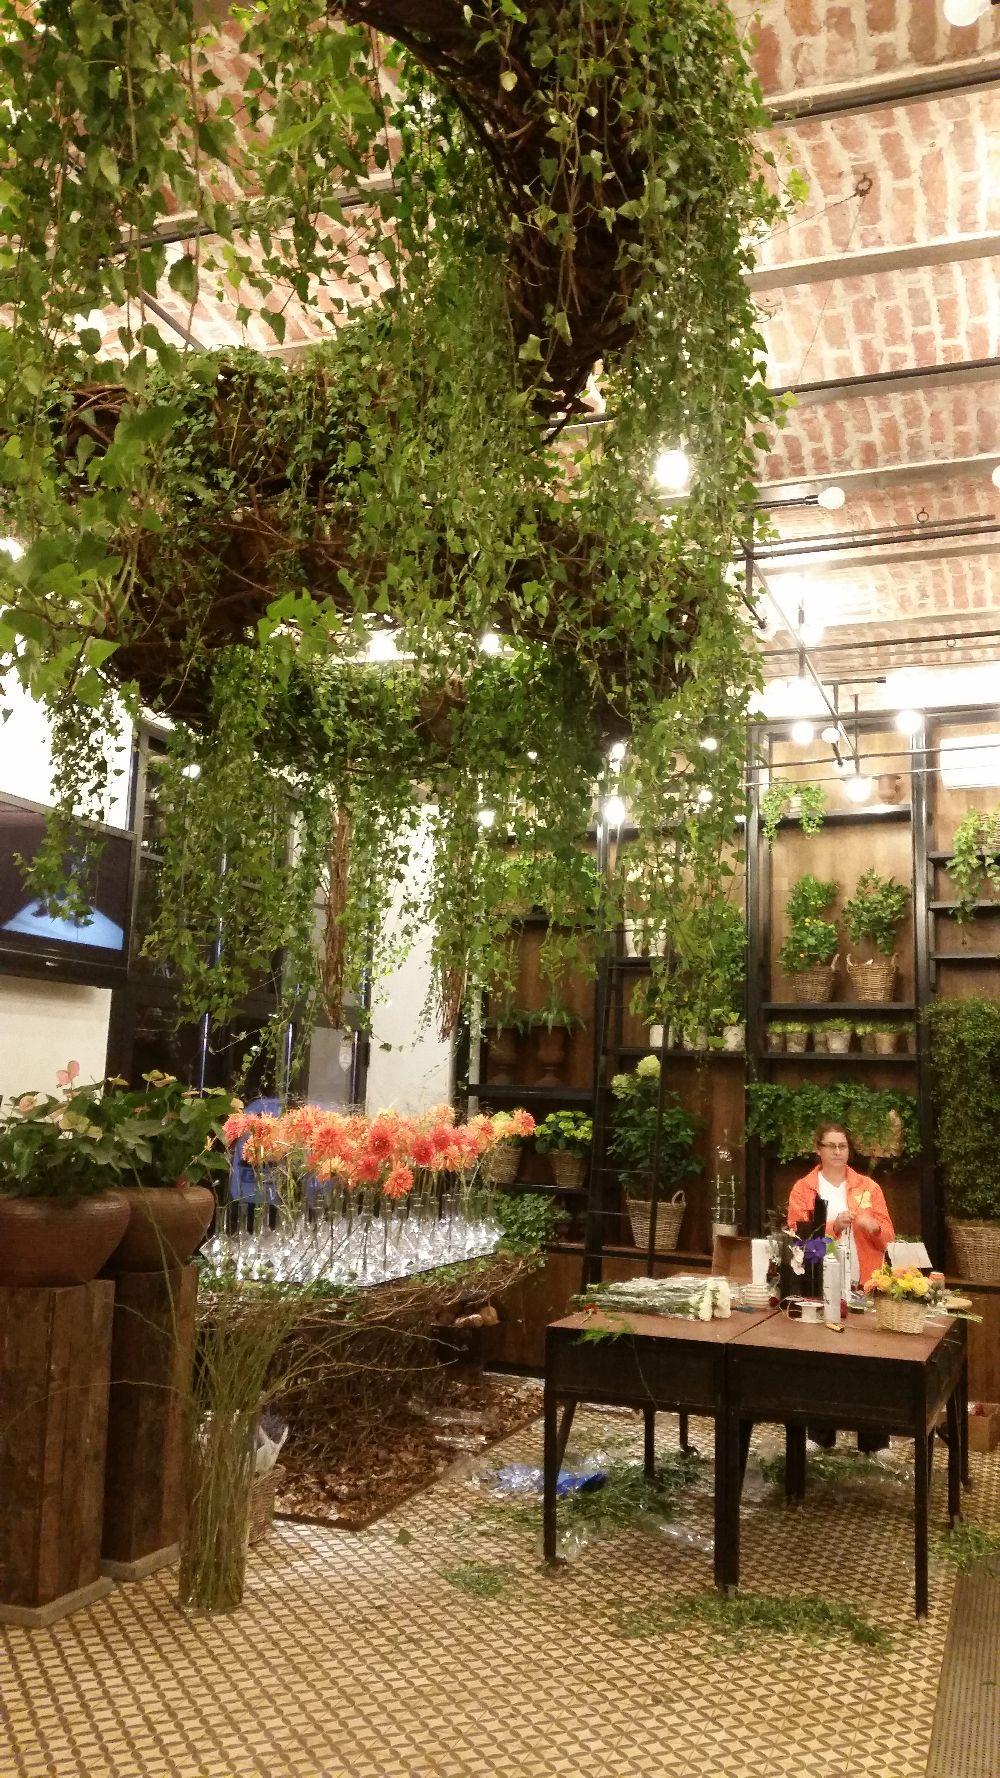 adelaparvu.com despre 45 de ani aniversare Floraria Iris, design floral Nicu Bocancea (53)